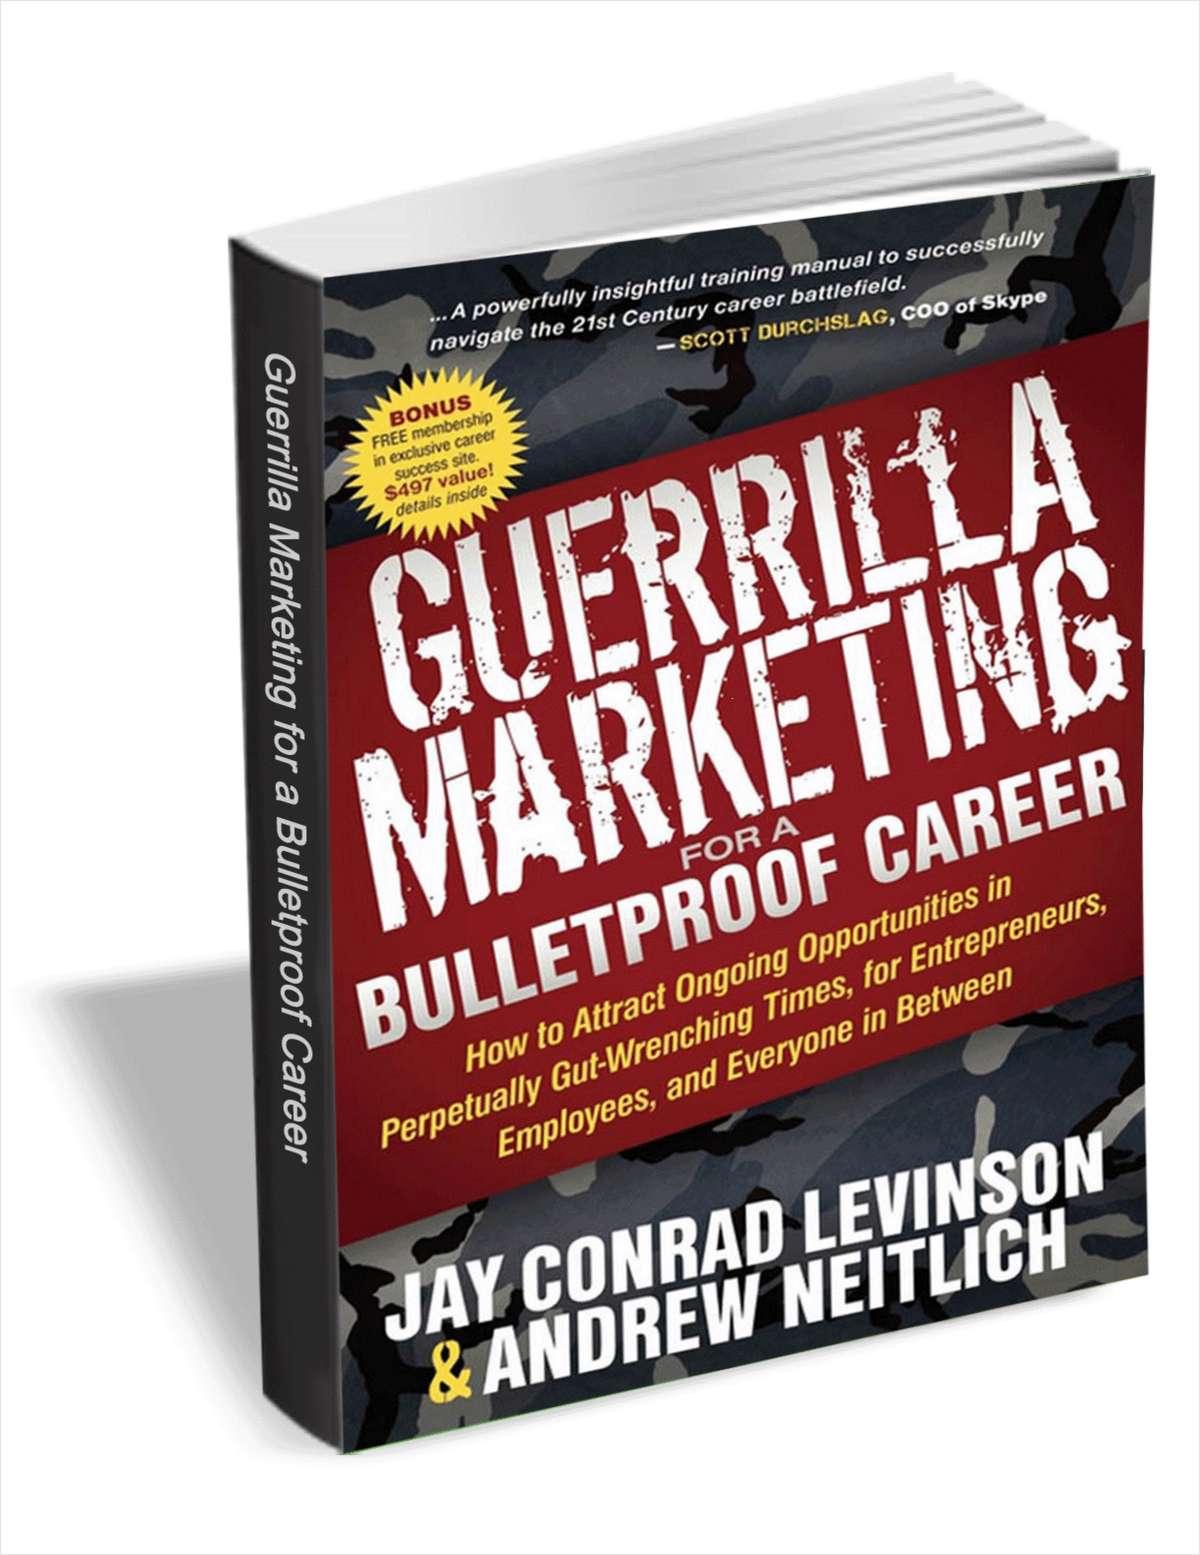 Guerrilla Marketing for a Bulletproof Career (Free eBook!) Originally $7.99